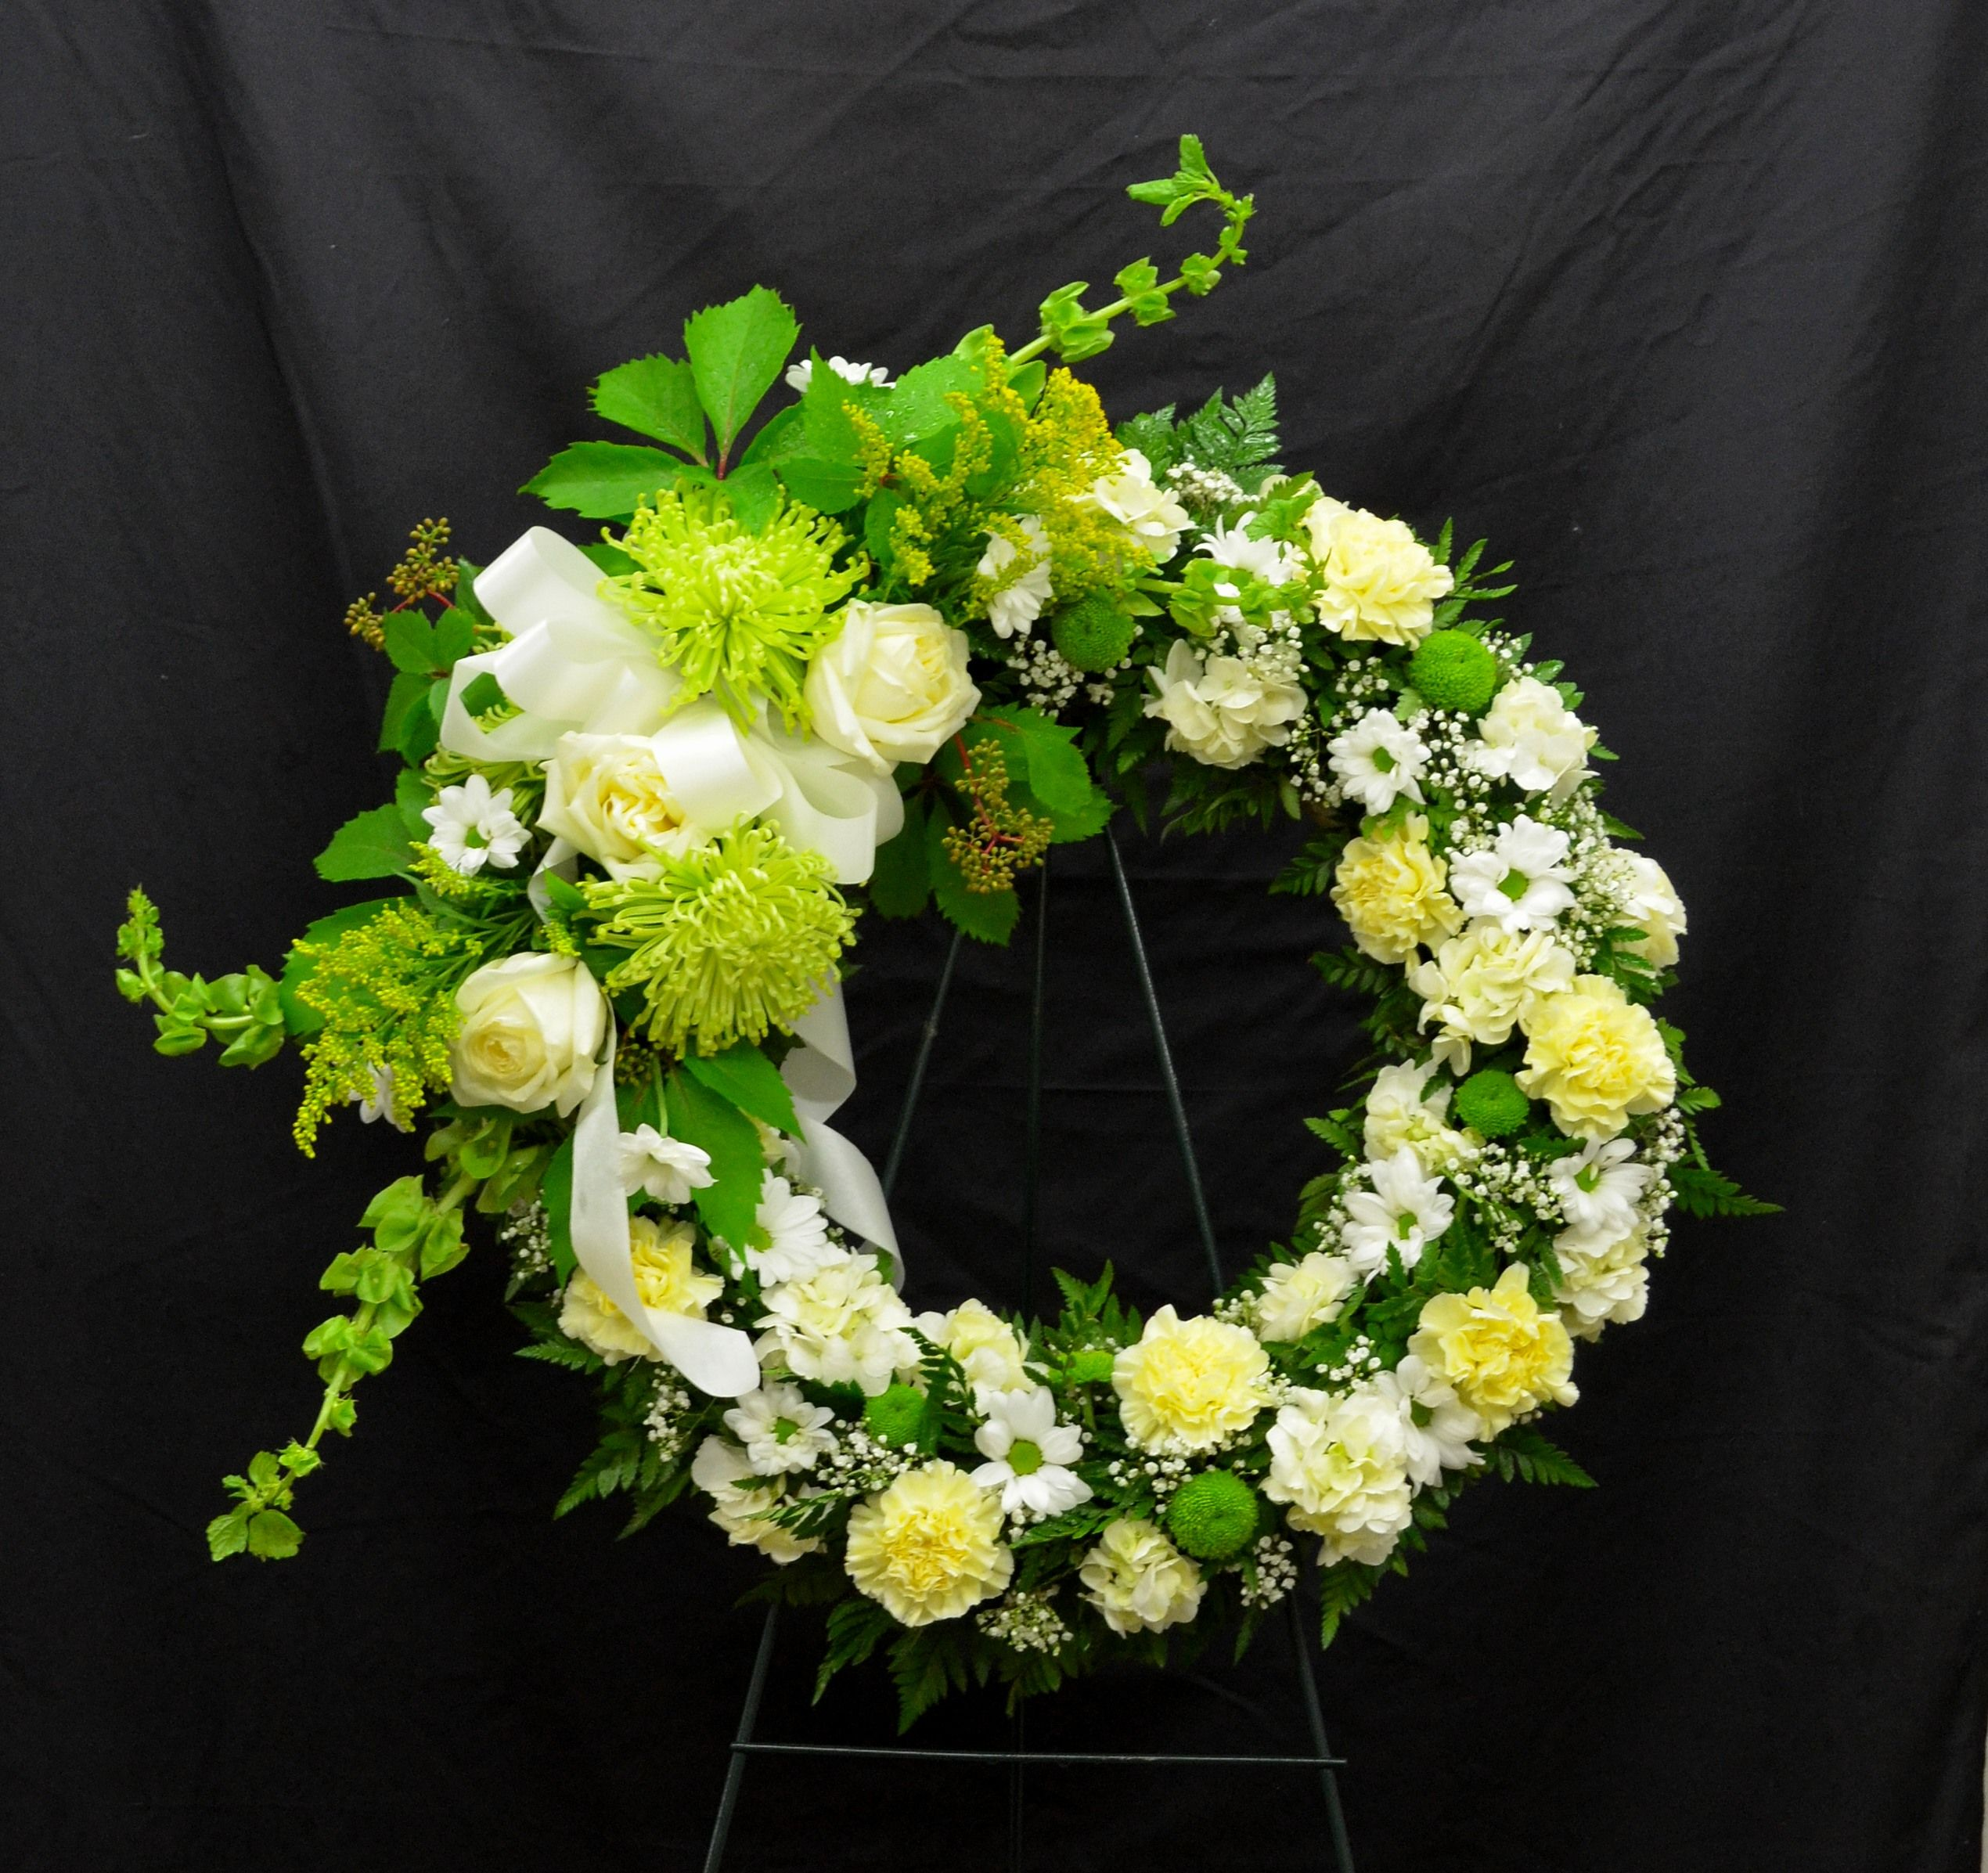 Wreath with a spray for a man flowers pinterest wreaths wreath with a spray for a man funeral flower arrangements vase arrangements funeral izmirmasajfo